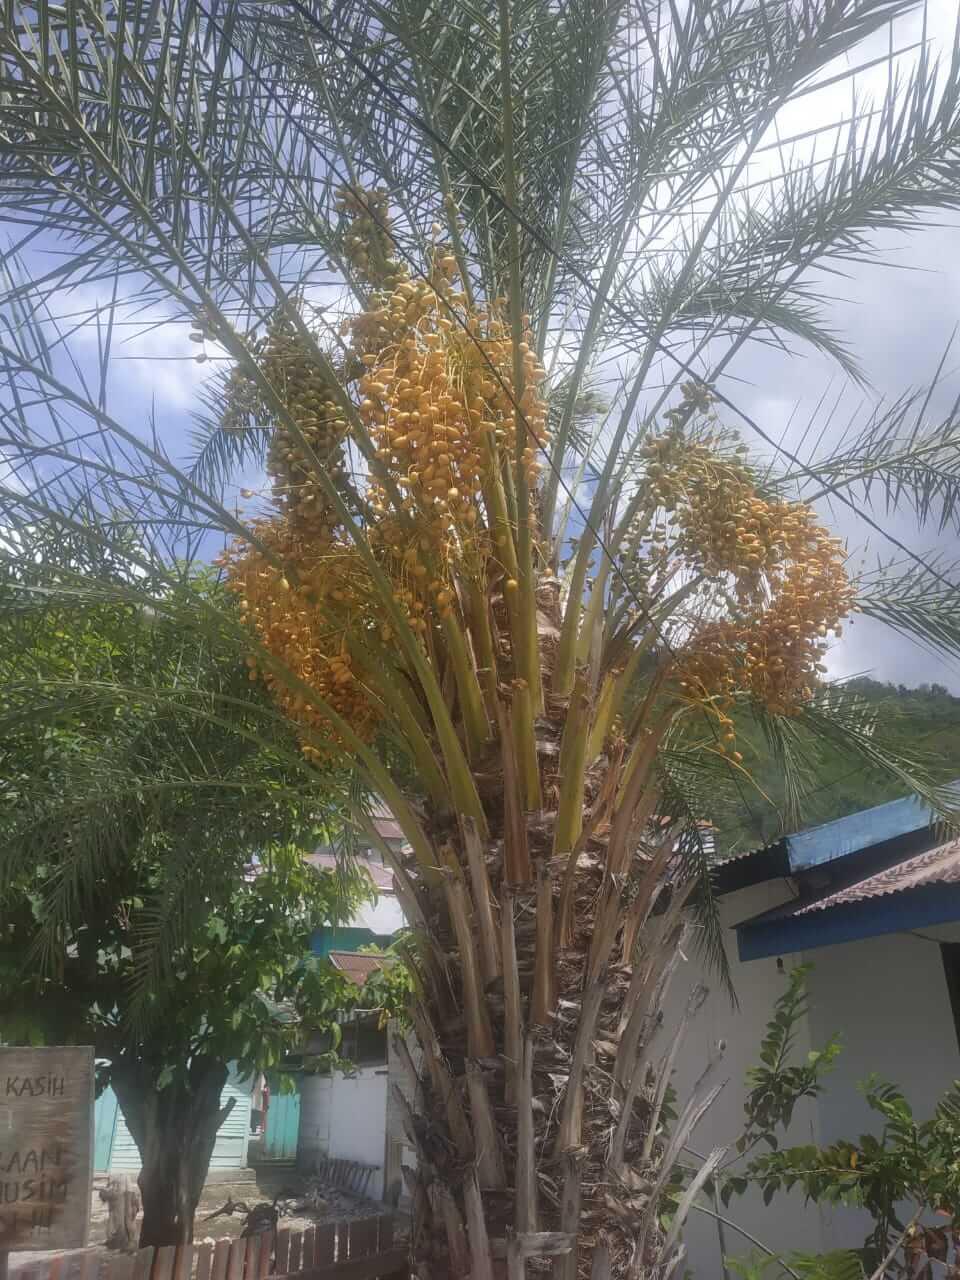 Pohon Kurma milik Oma berbuah lebat di Luwuk, Senin (24/02/2020). Foto : Irsan/LT